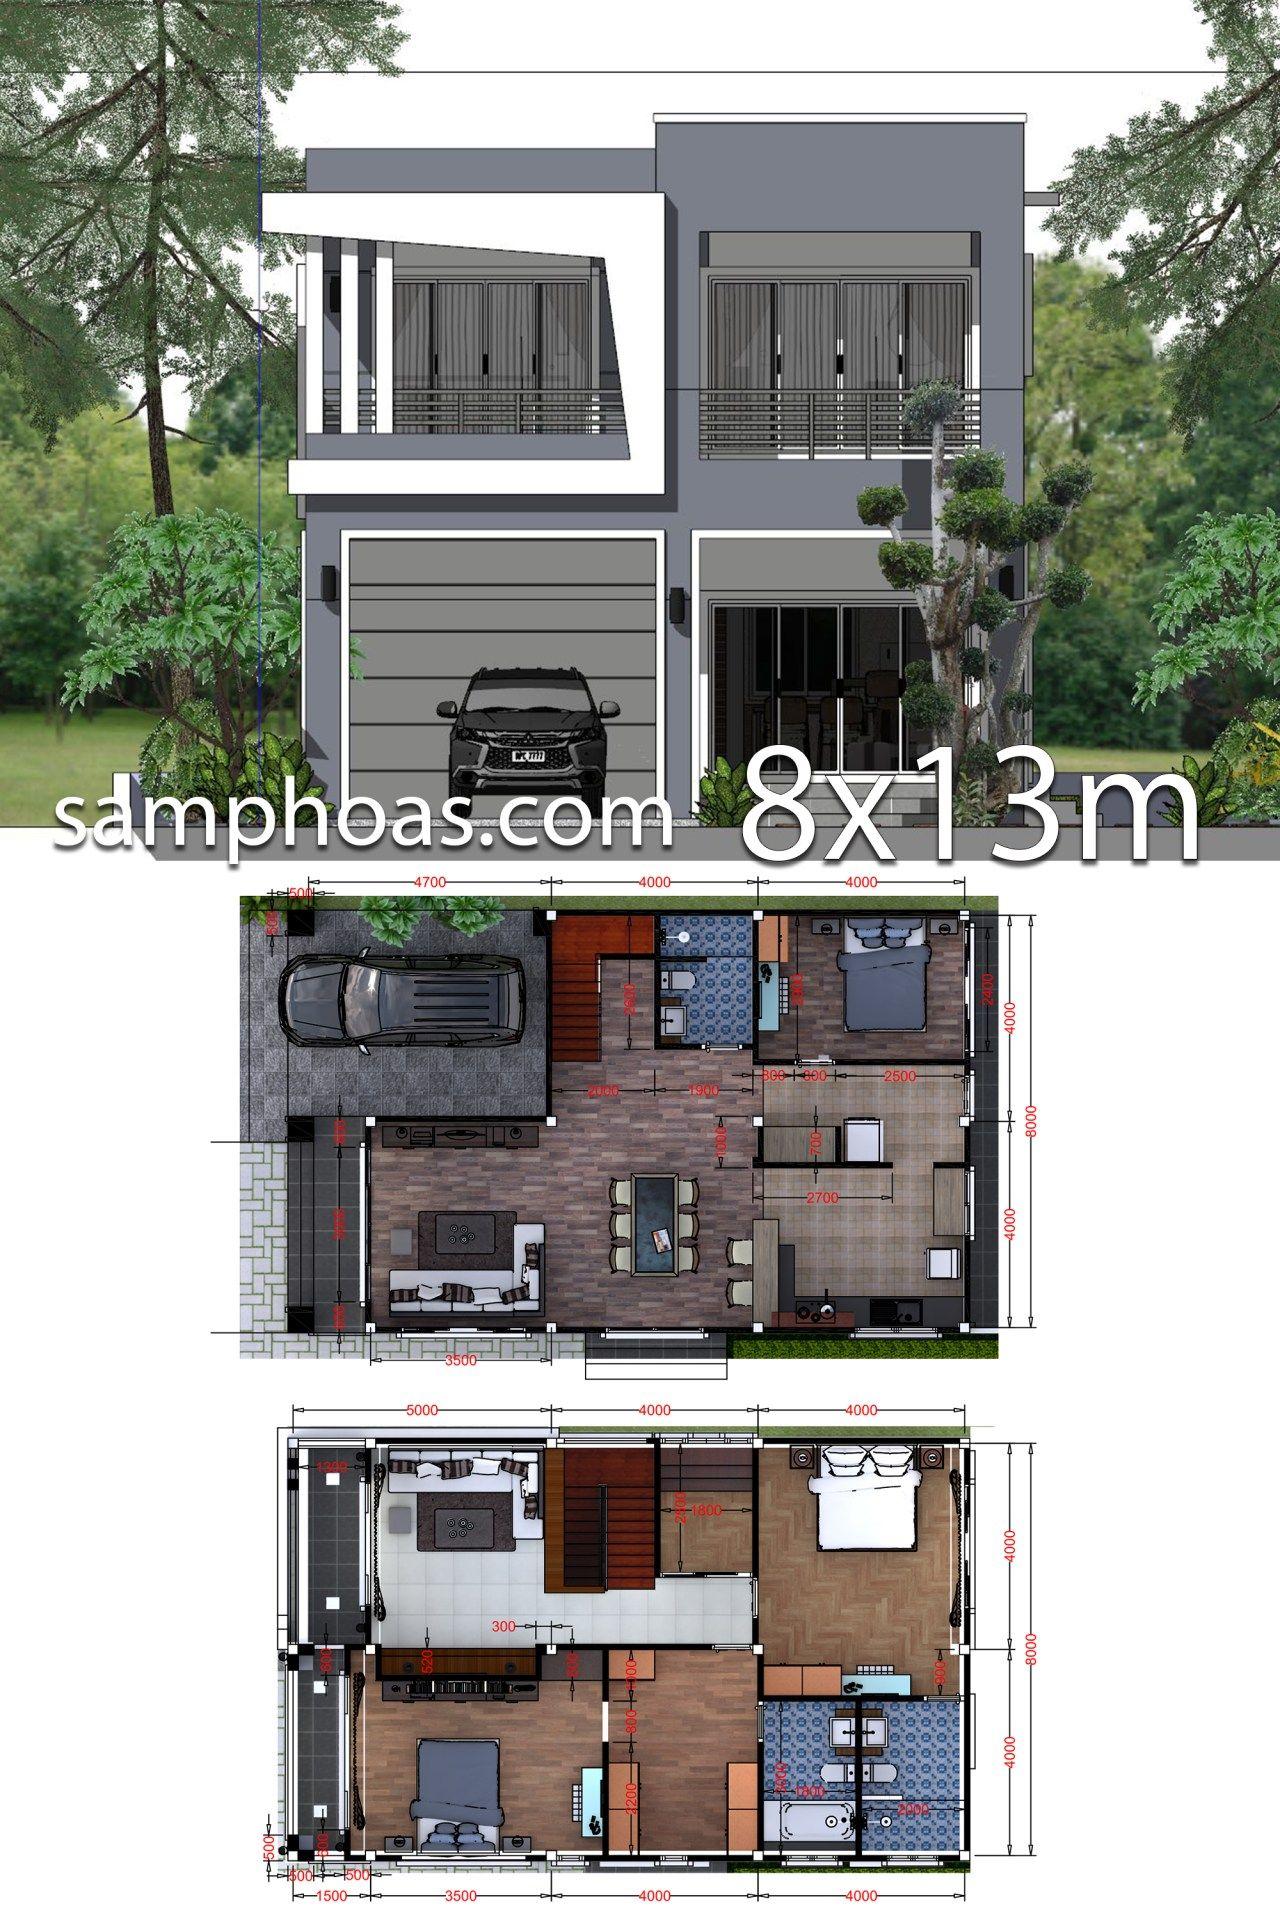 Plan 3d Interior Design Home Plan 8x13m Full Plan 3beds Samphoas Plan Interior Design Plan 3d Interior Design House Plans